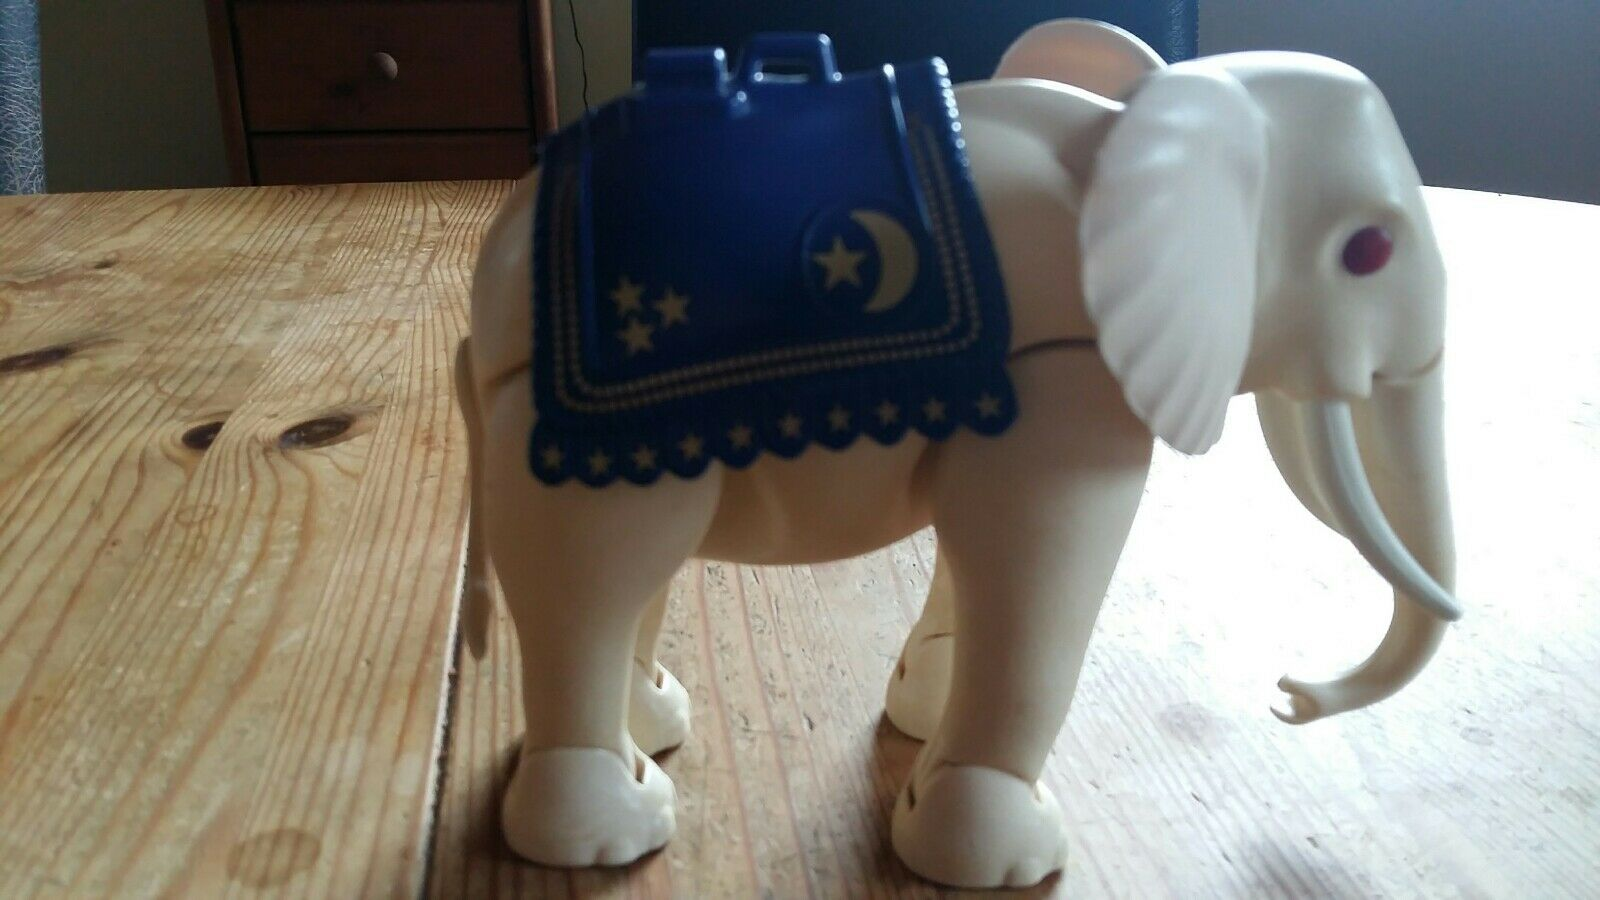 Playmobil Playmobil Playmobil weißer Elefant selten rar 729719